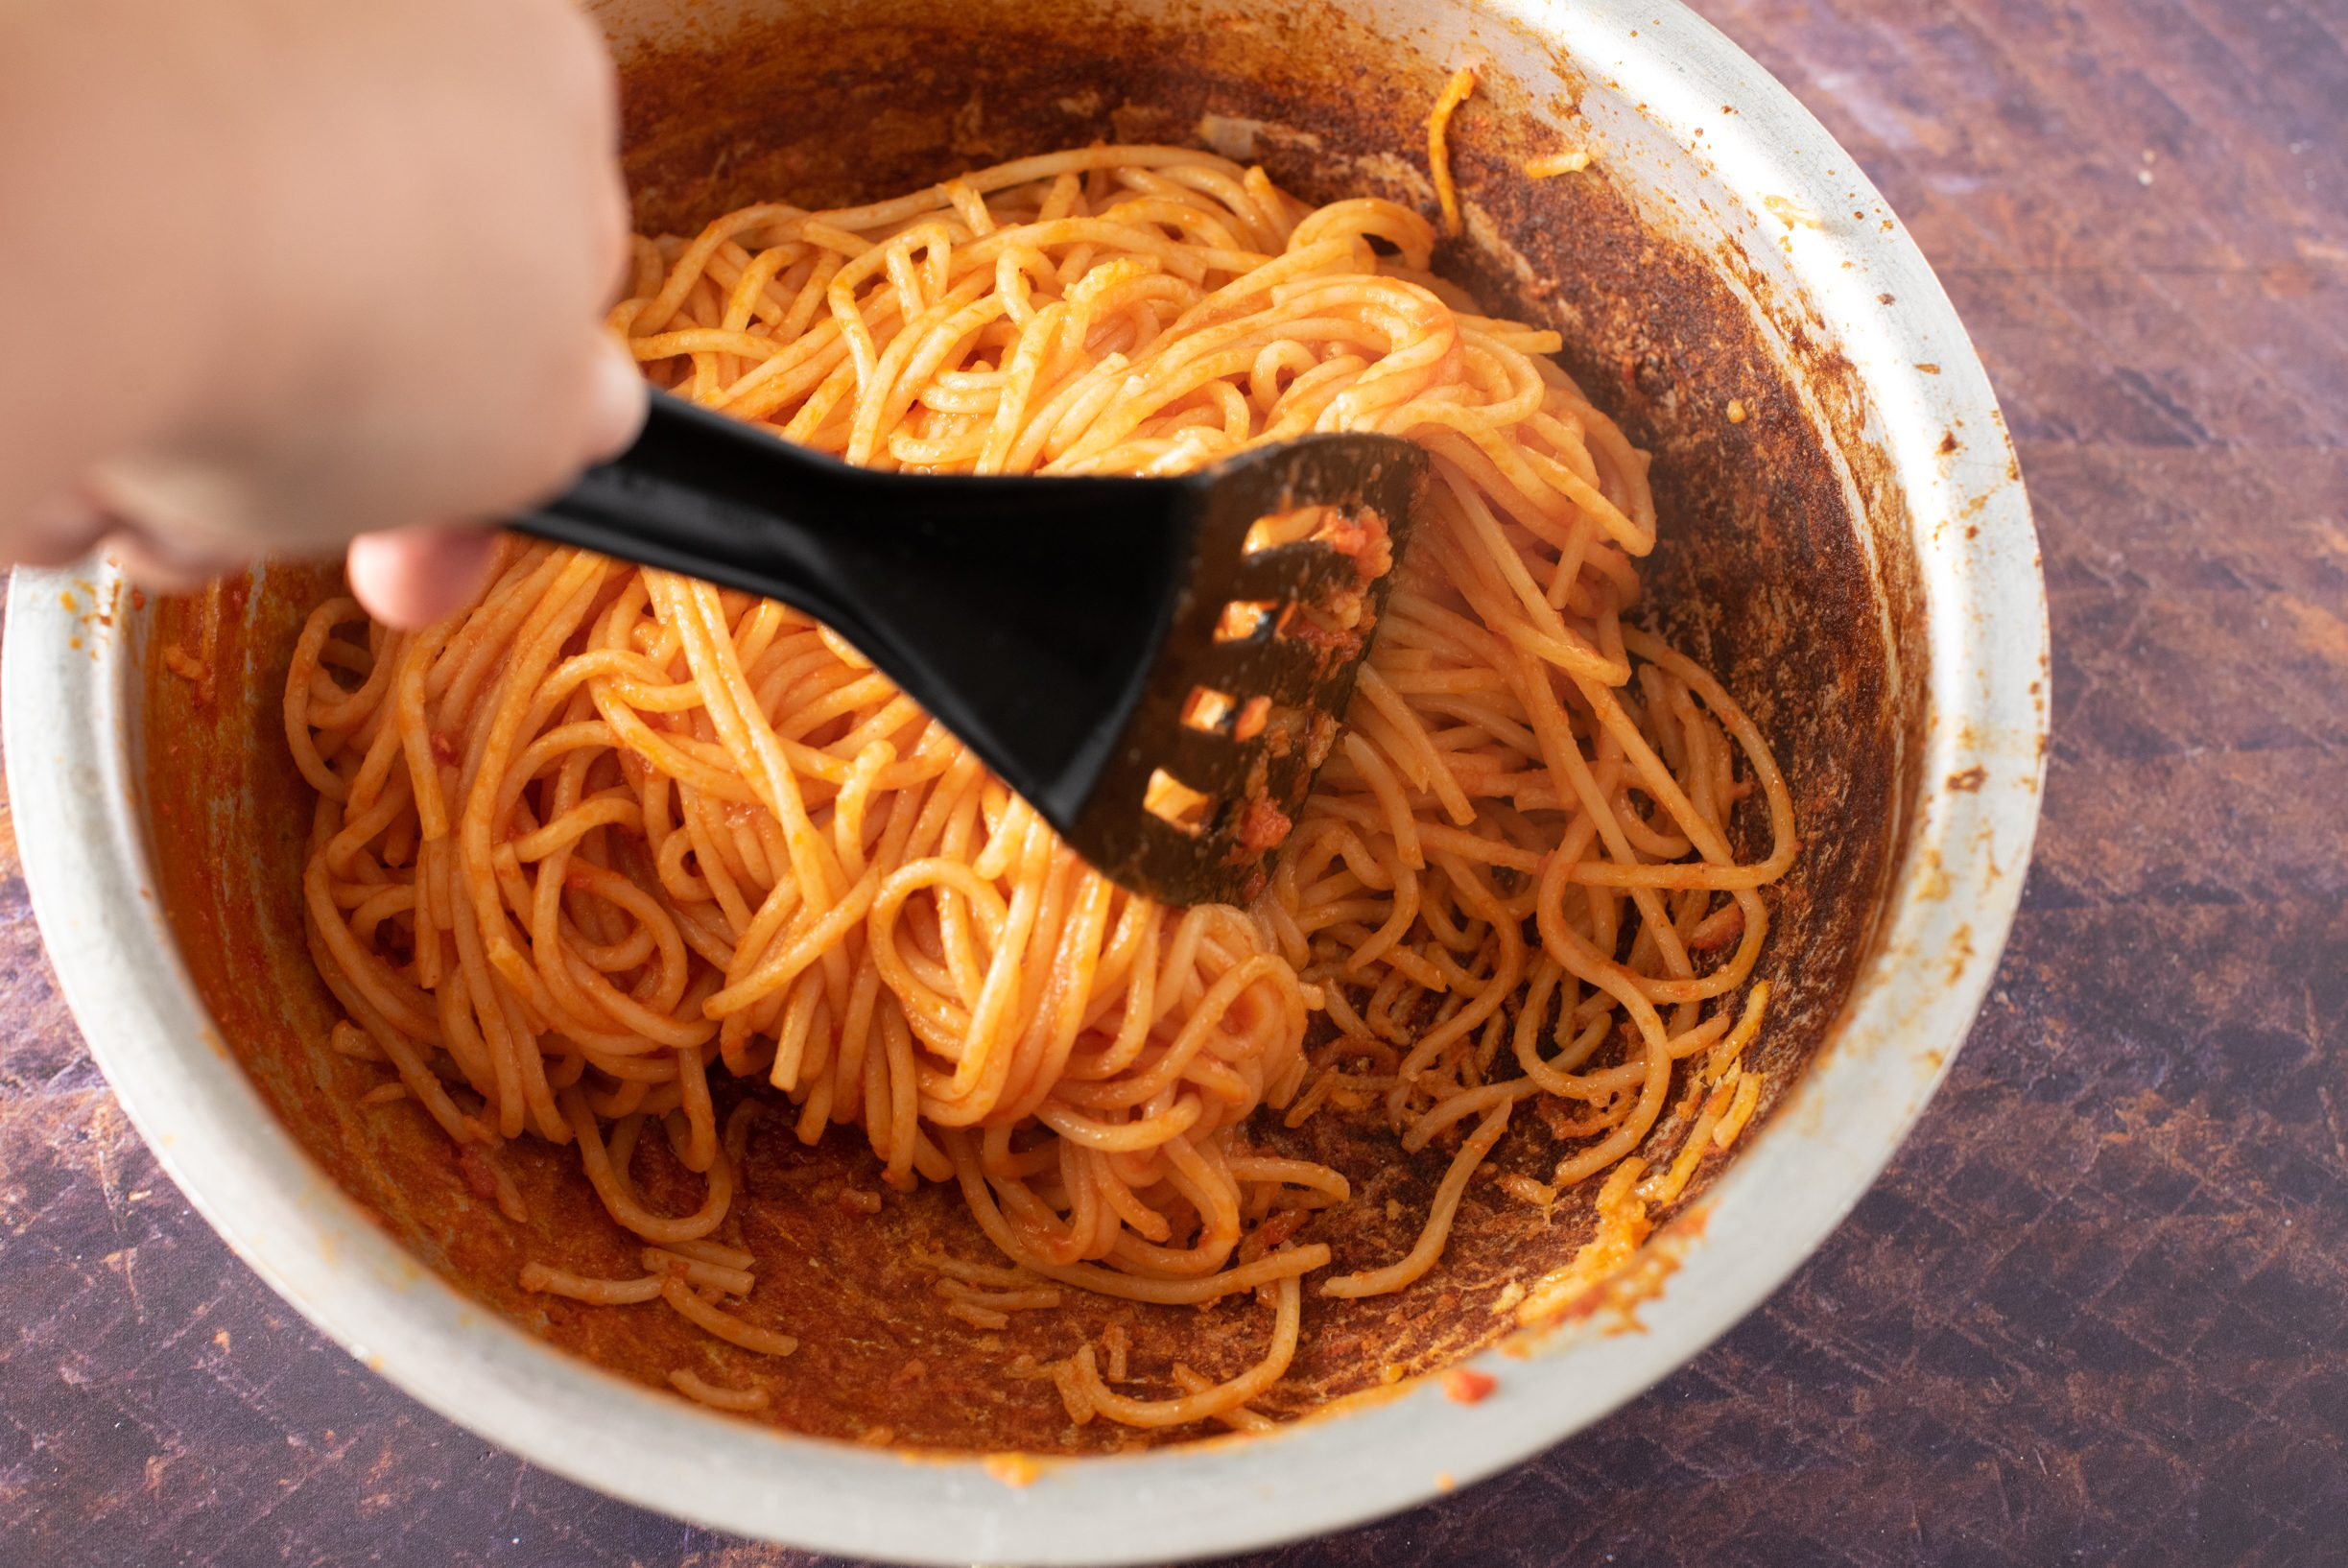 Spaghetti all'assassina, mescolate